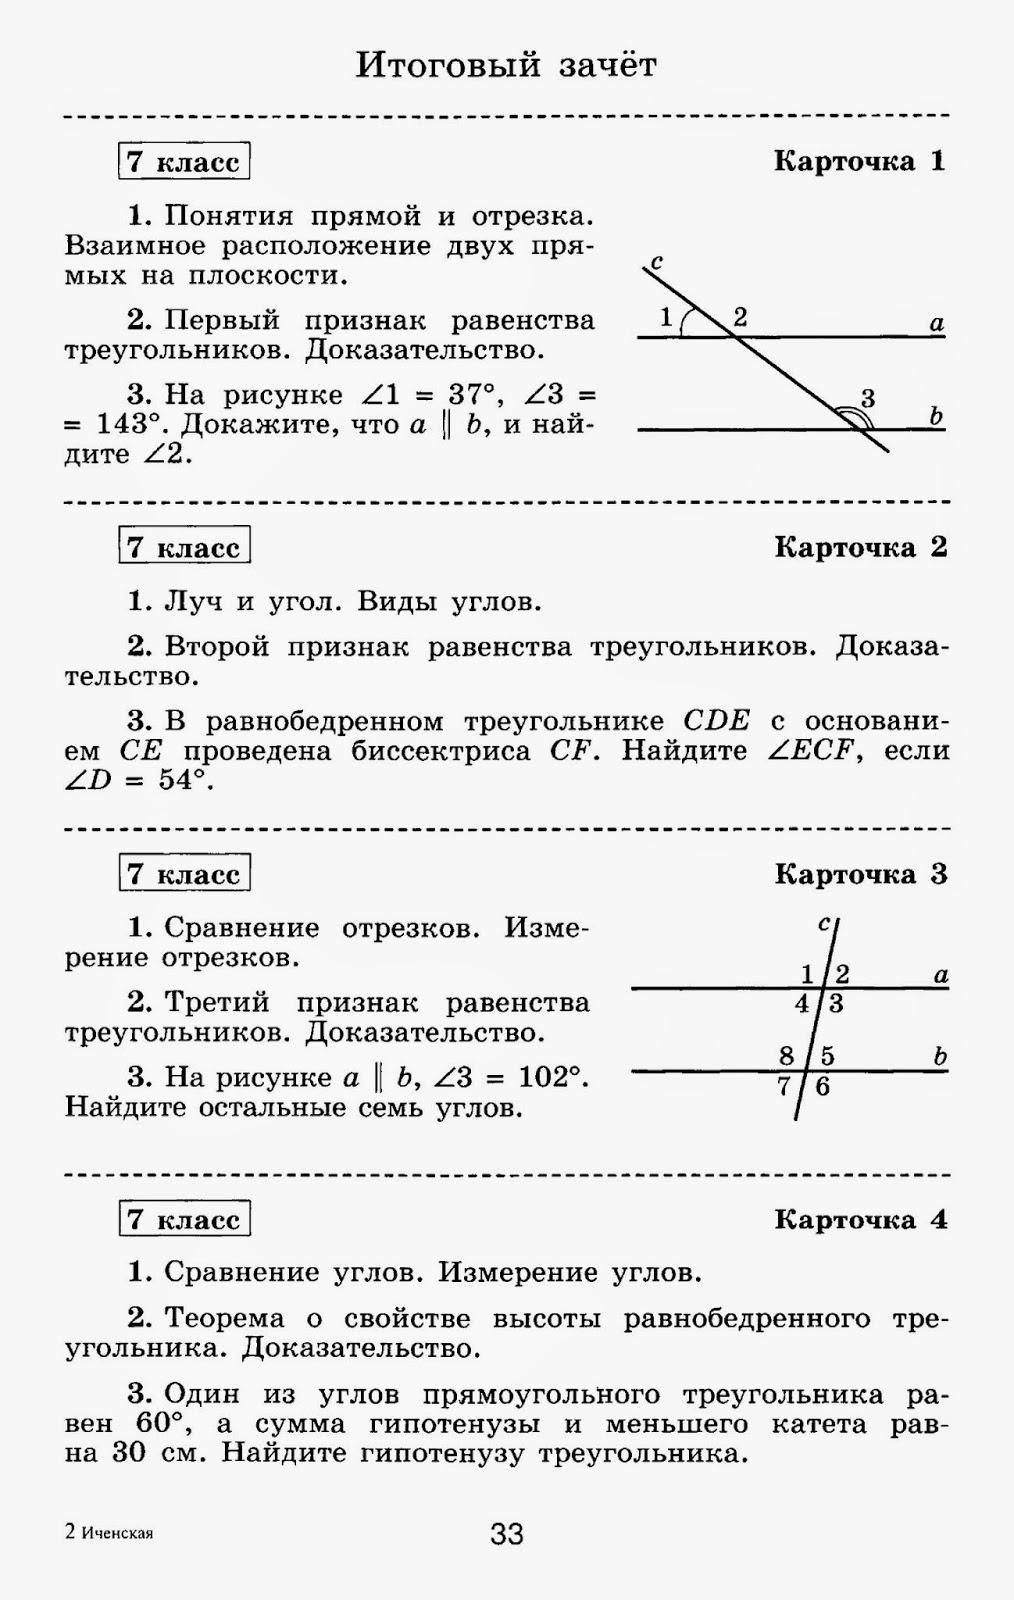 зачета геометрии по для гдз